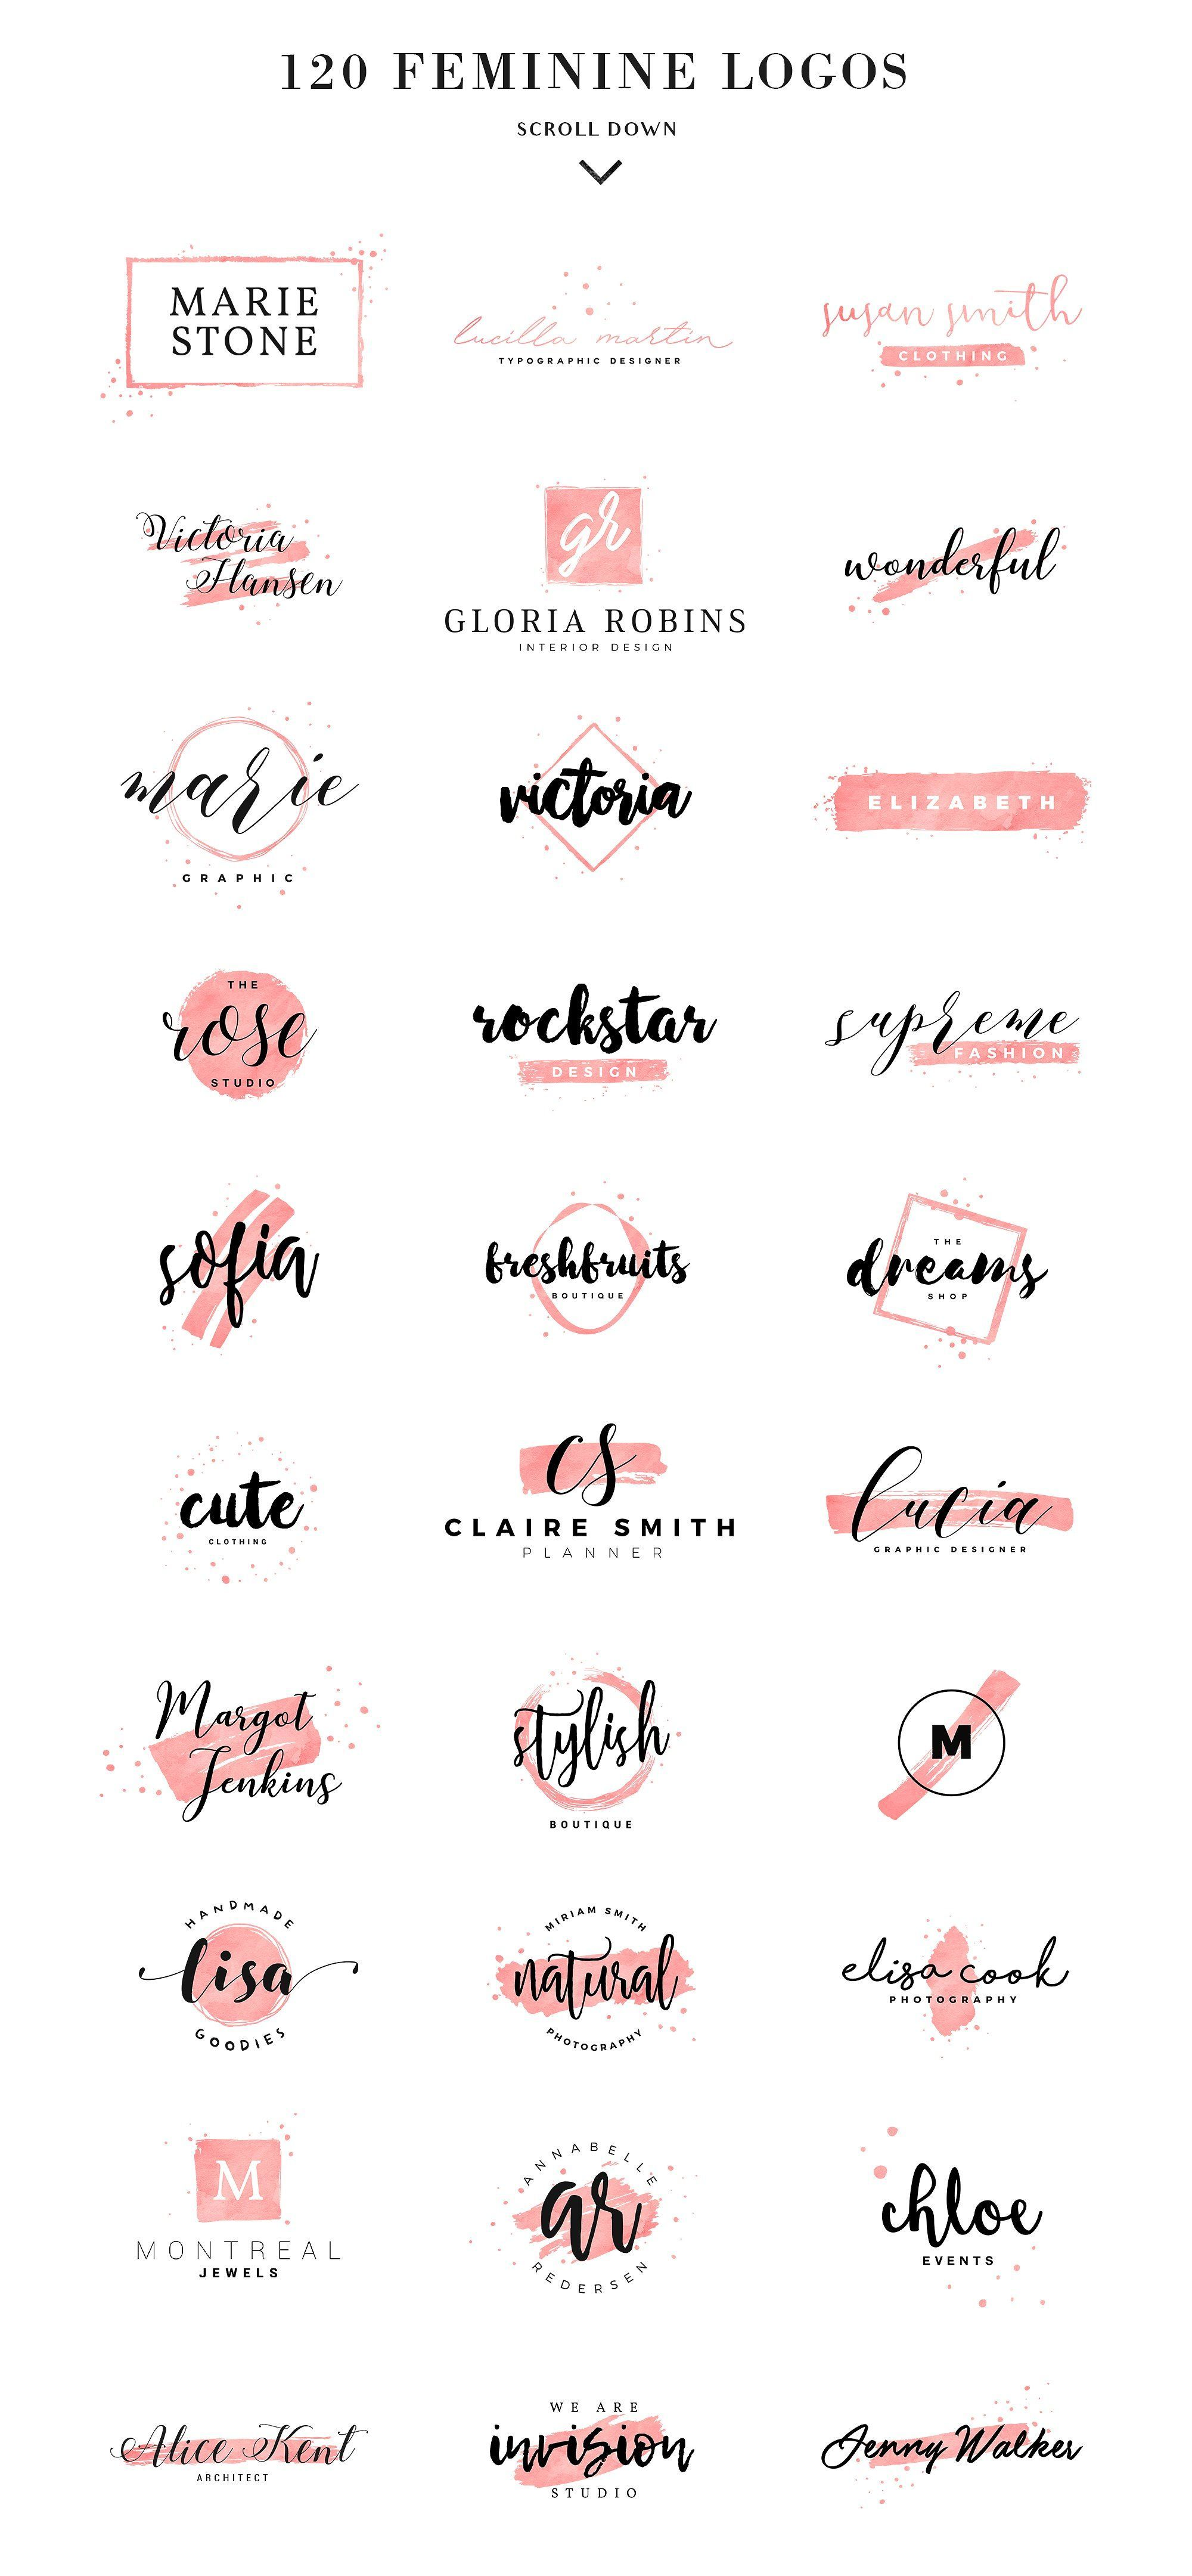 120 Feminine Branding Logos by Davide Bassu on